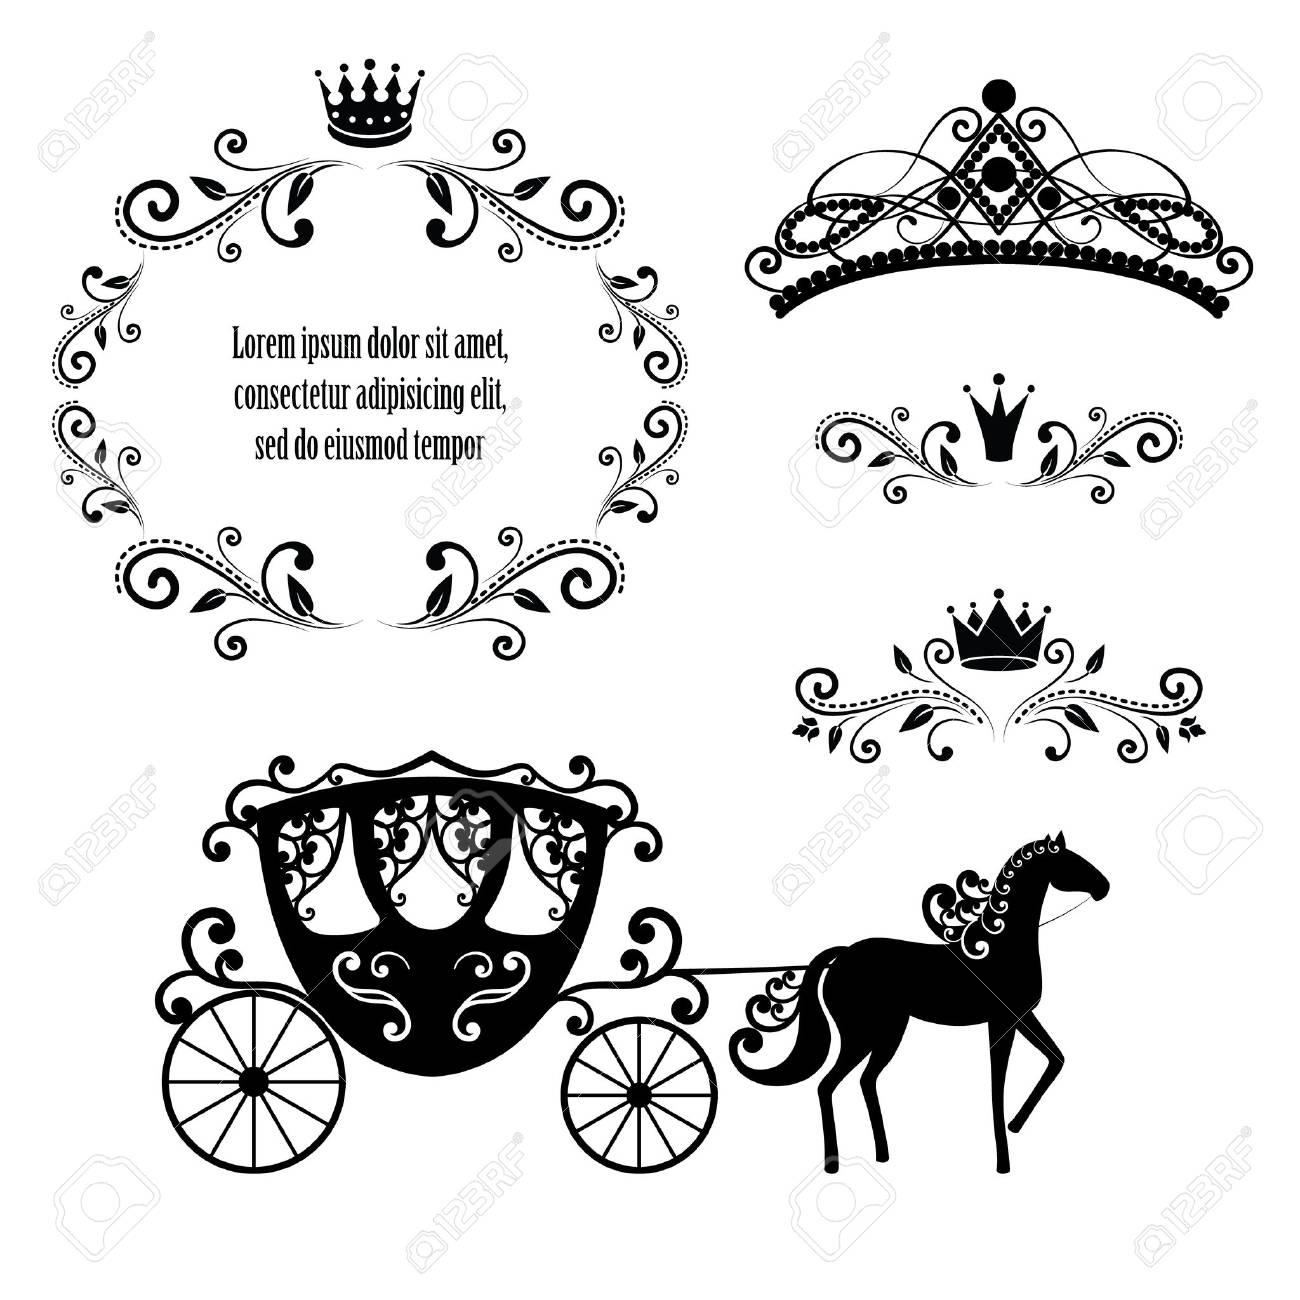 Elementos De Diseño, Marco De Realeza Vintage Con Corona, Diadema De ...